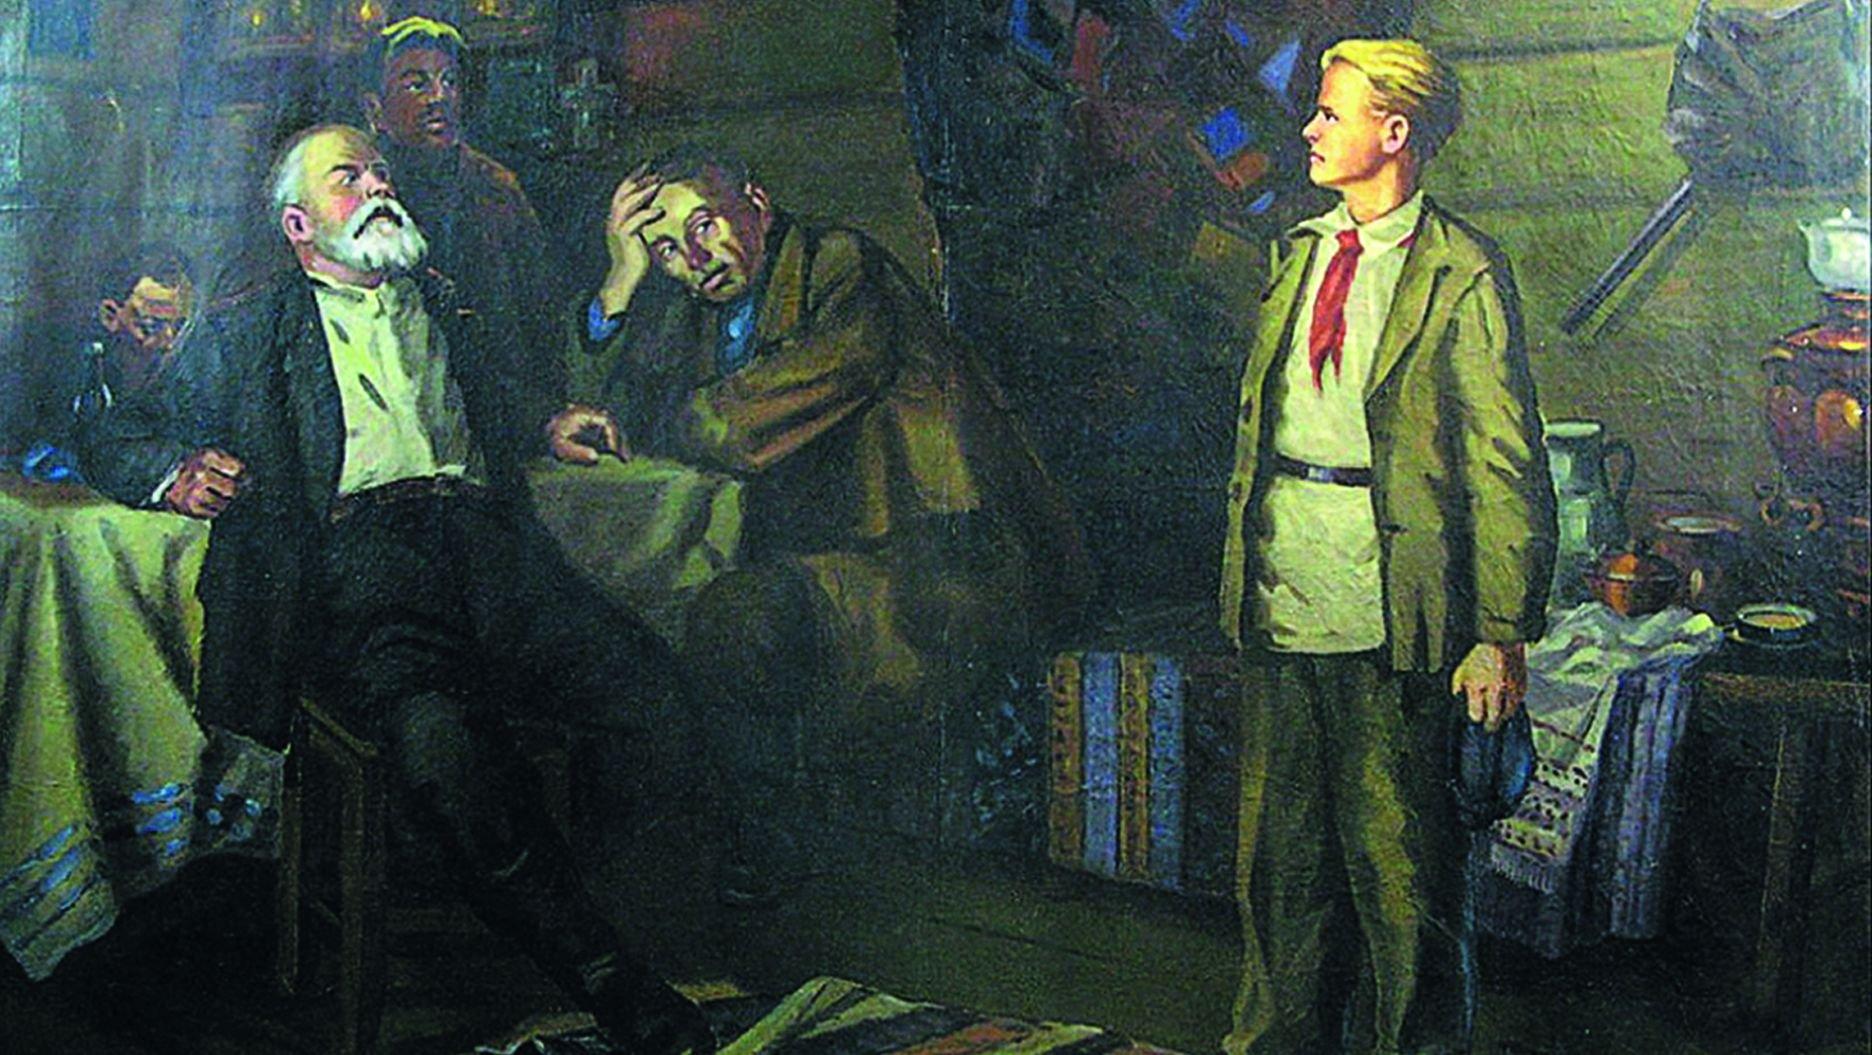 Н.Н. Чебаков. Павлик Морозов. 1952 г. Фото: Родина